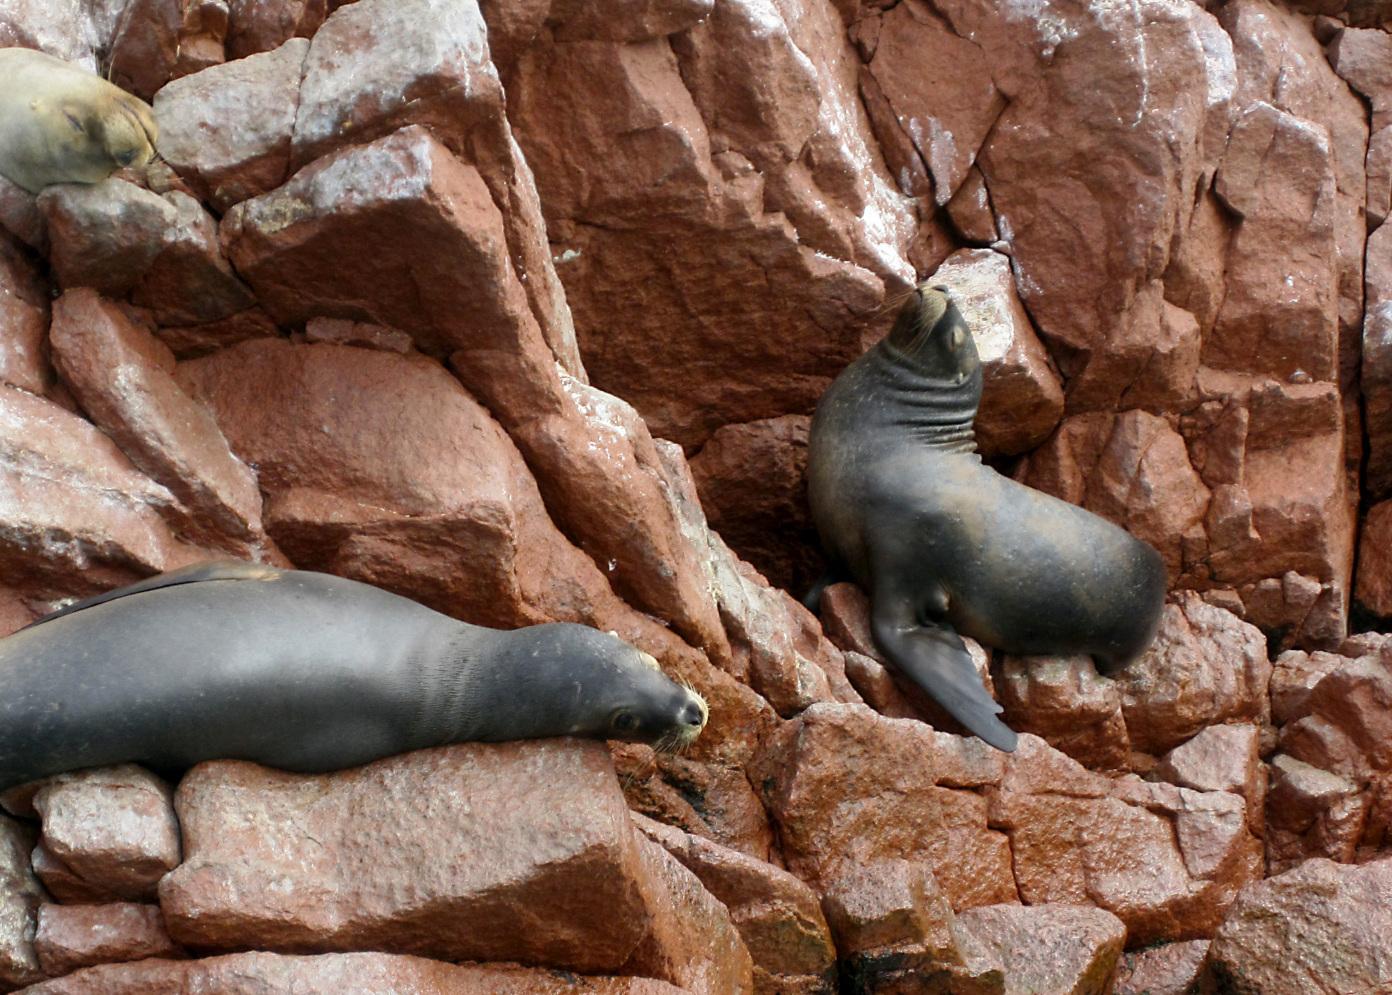 Dramatic sea lions